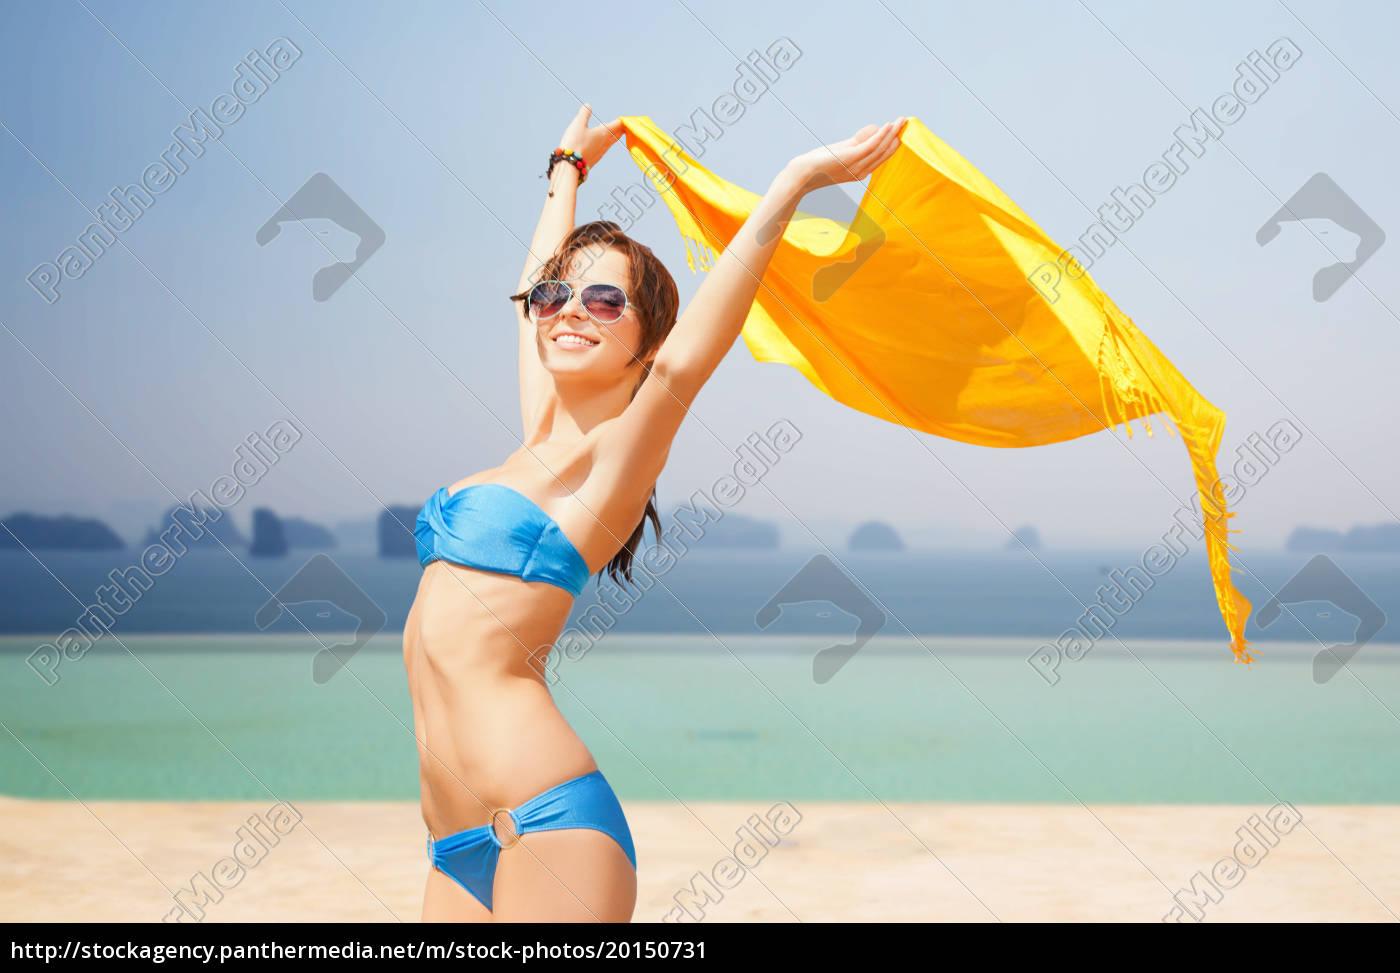 woman, in, bikini, and, sunglasses, over - 20150731